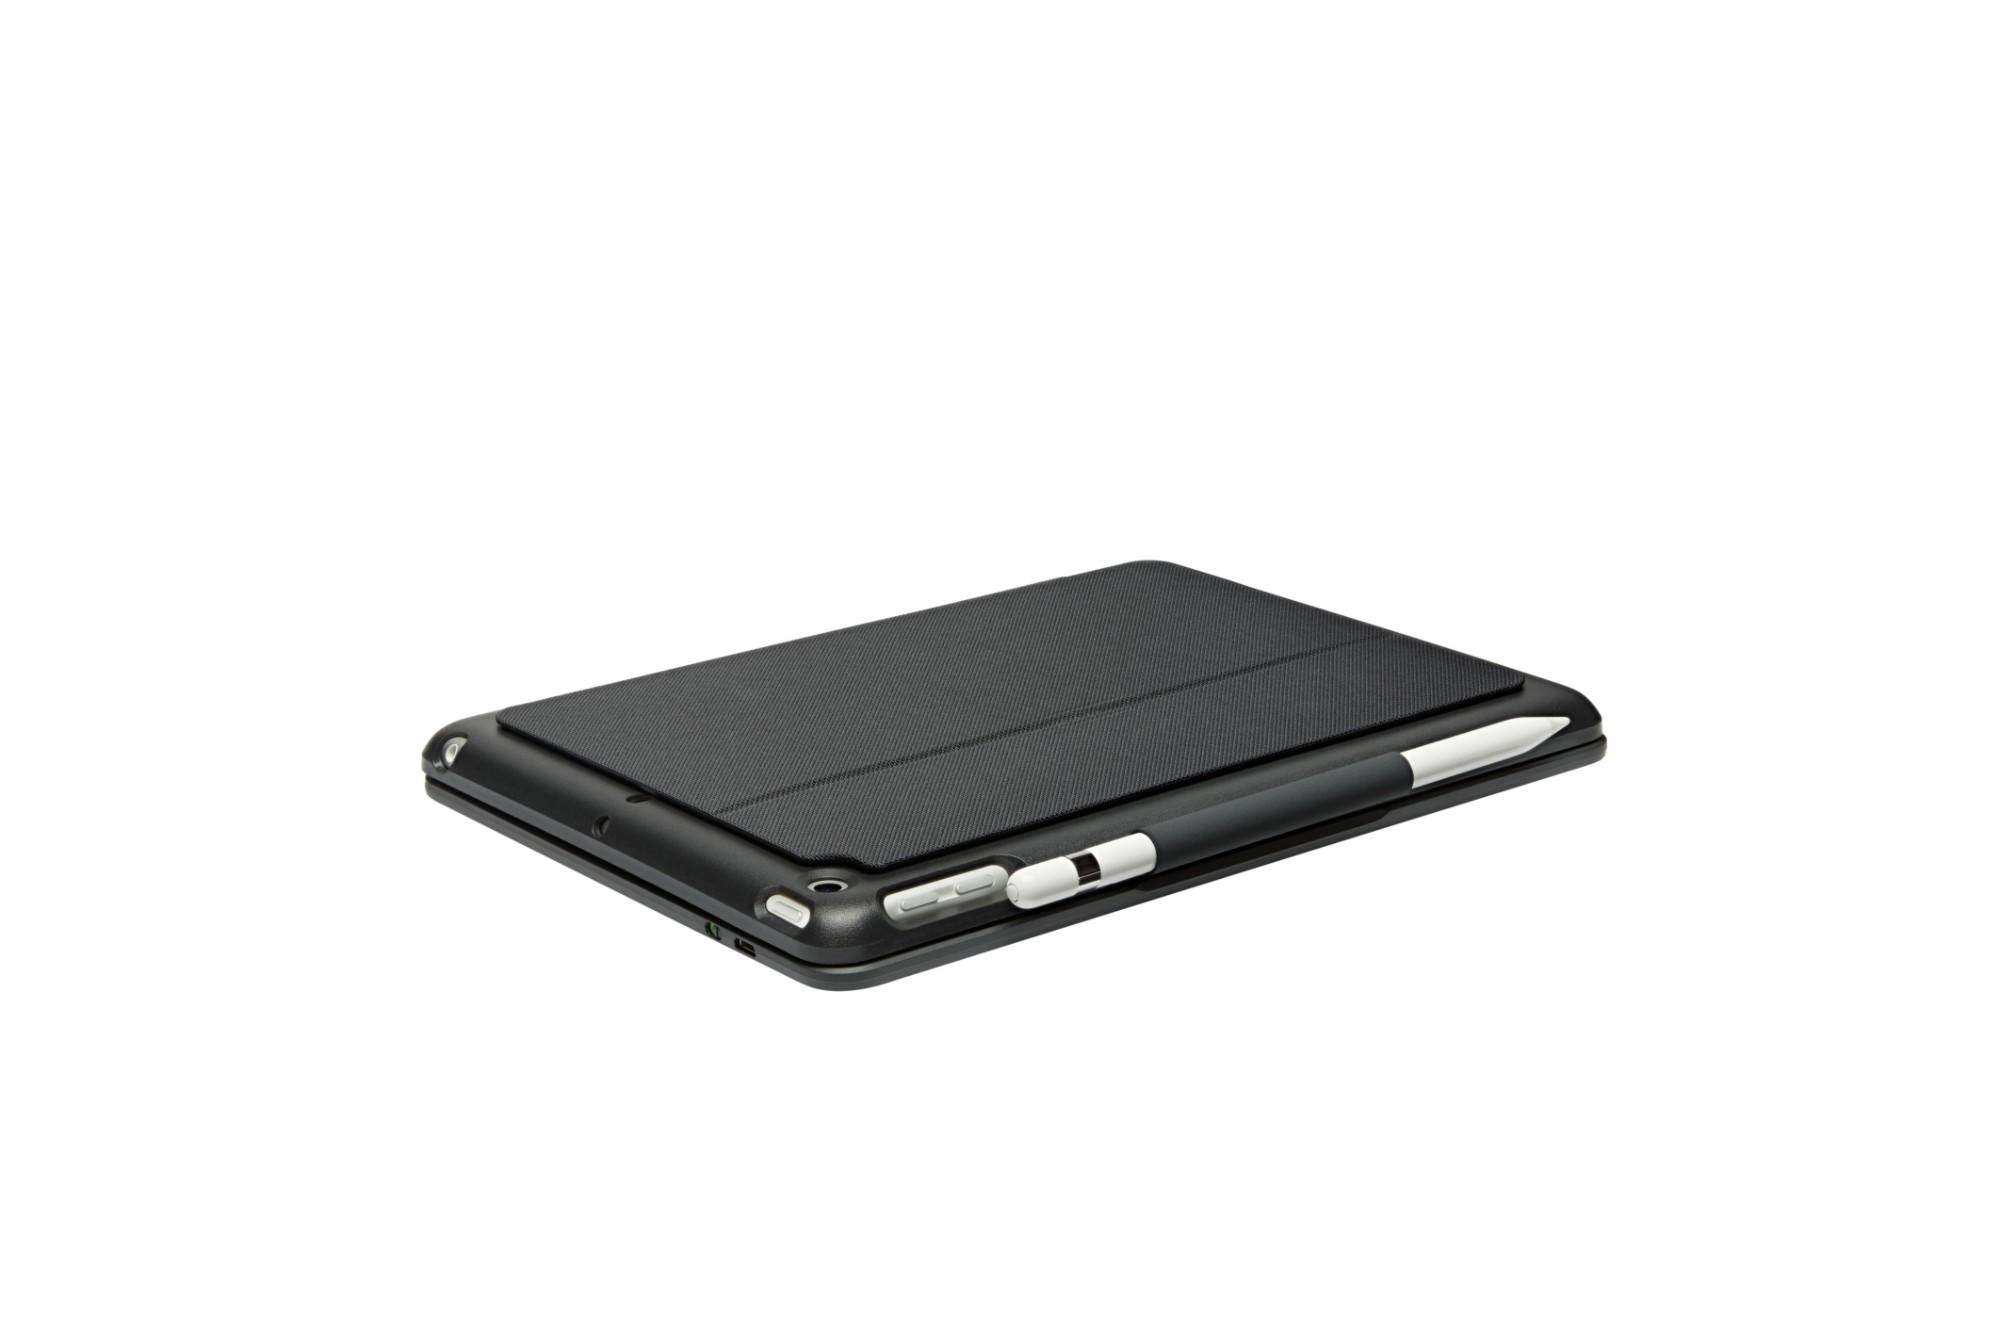 Logitech Slim Combo teclado para móvil QWERTY Español Negro Bluetooth